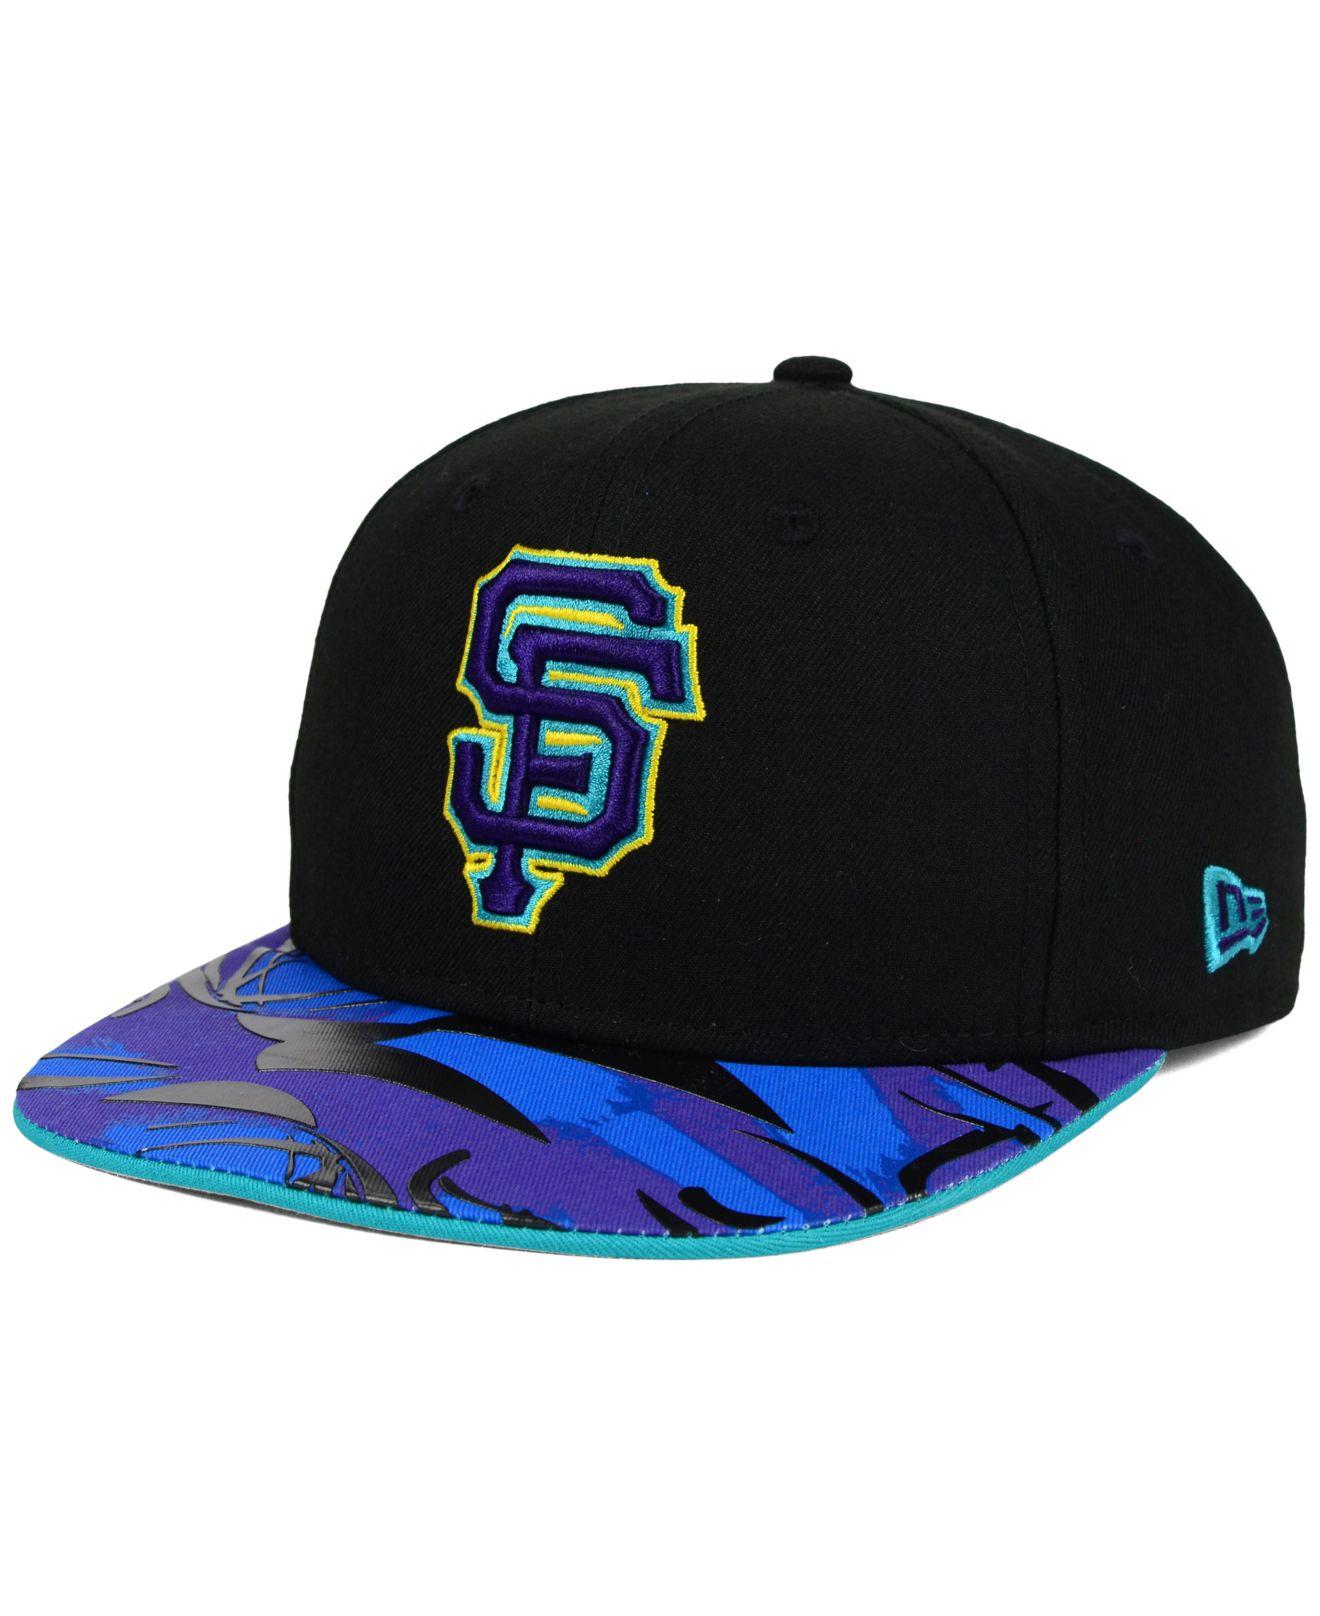 cheap for discount a6bc8 ef208 Lyst - KTZ San Francisco Giants Aqua Hook Vize 9fifty Snapback Cap ...